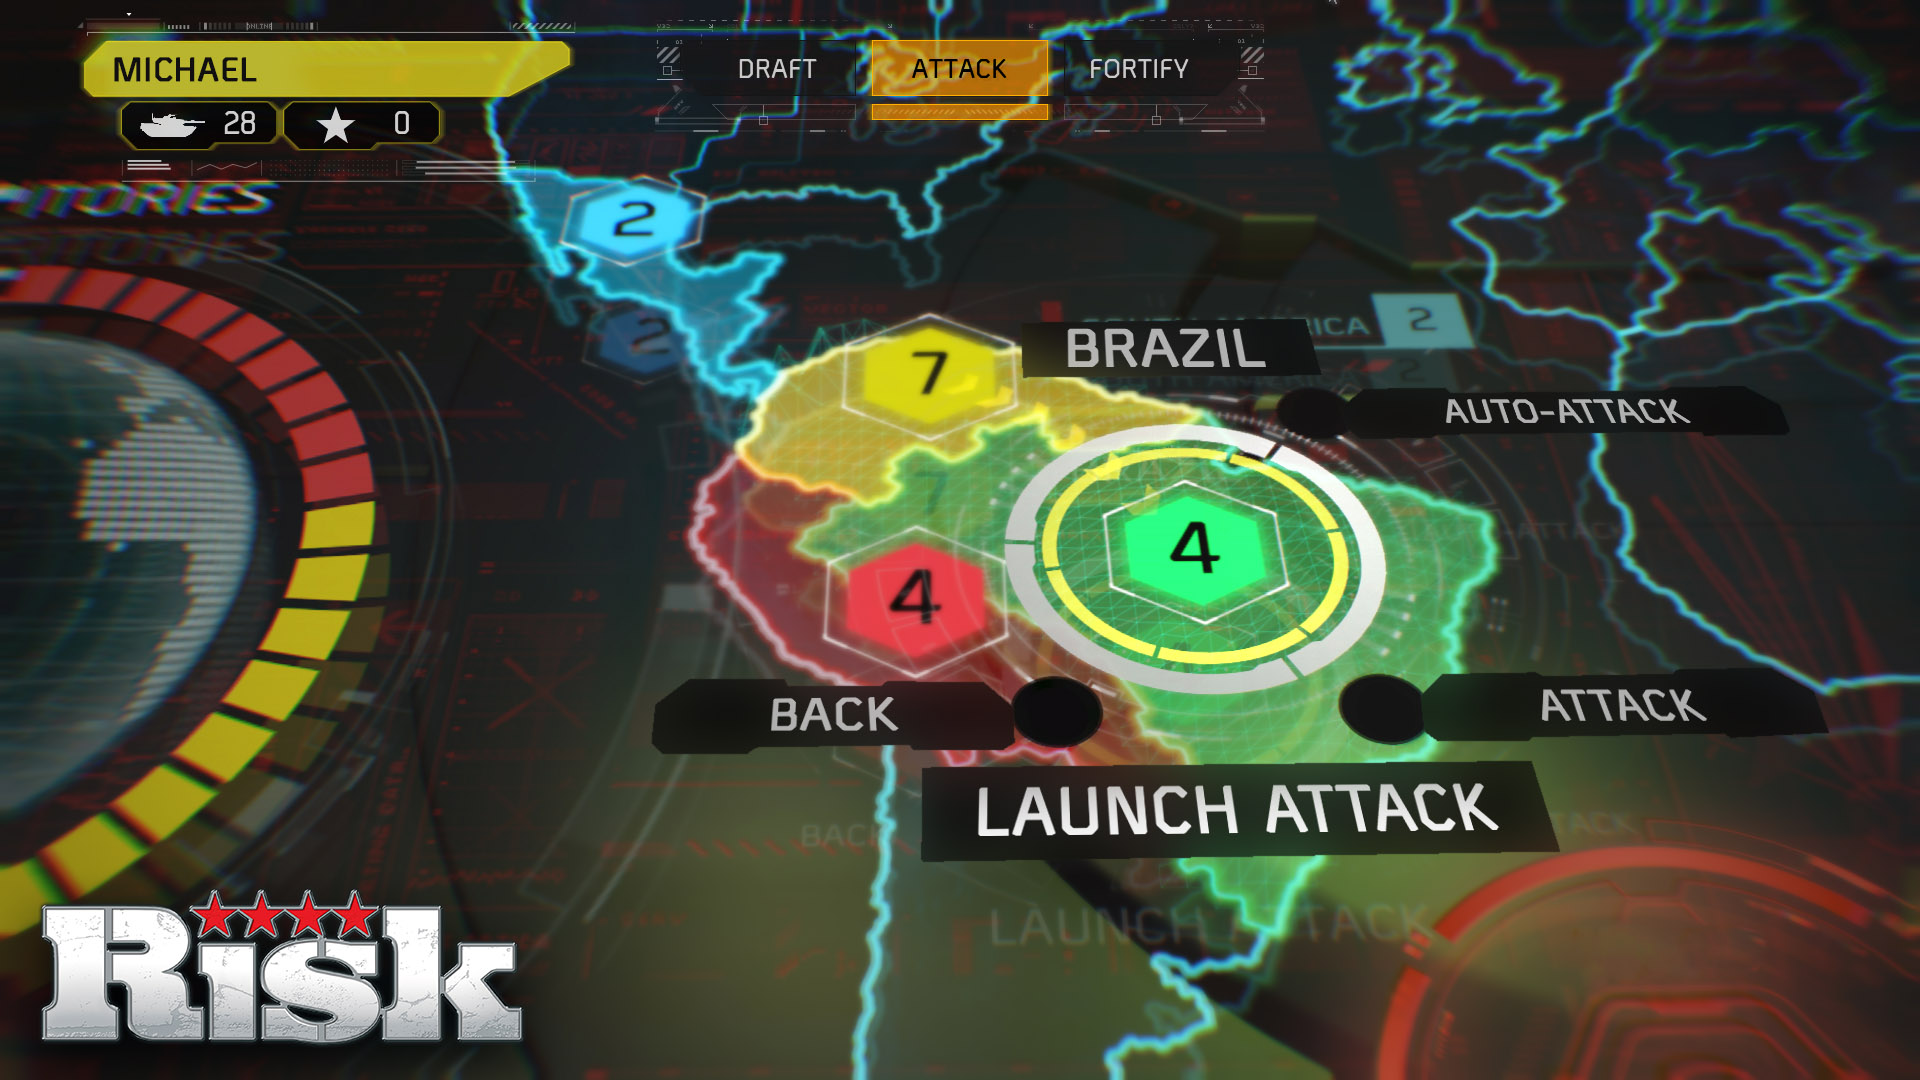 HGC Risk Screens 6